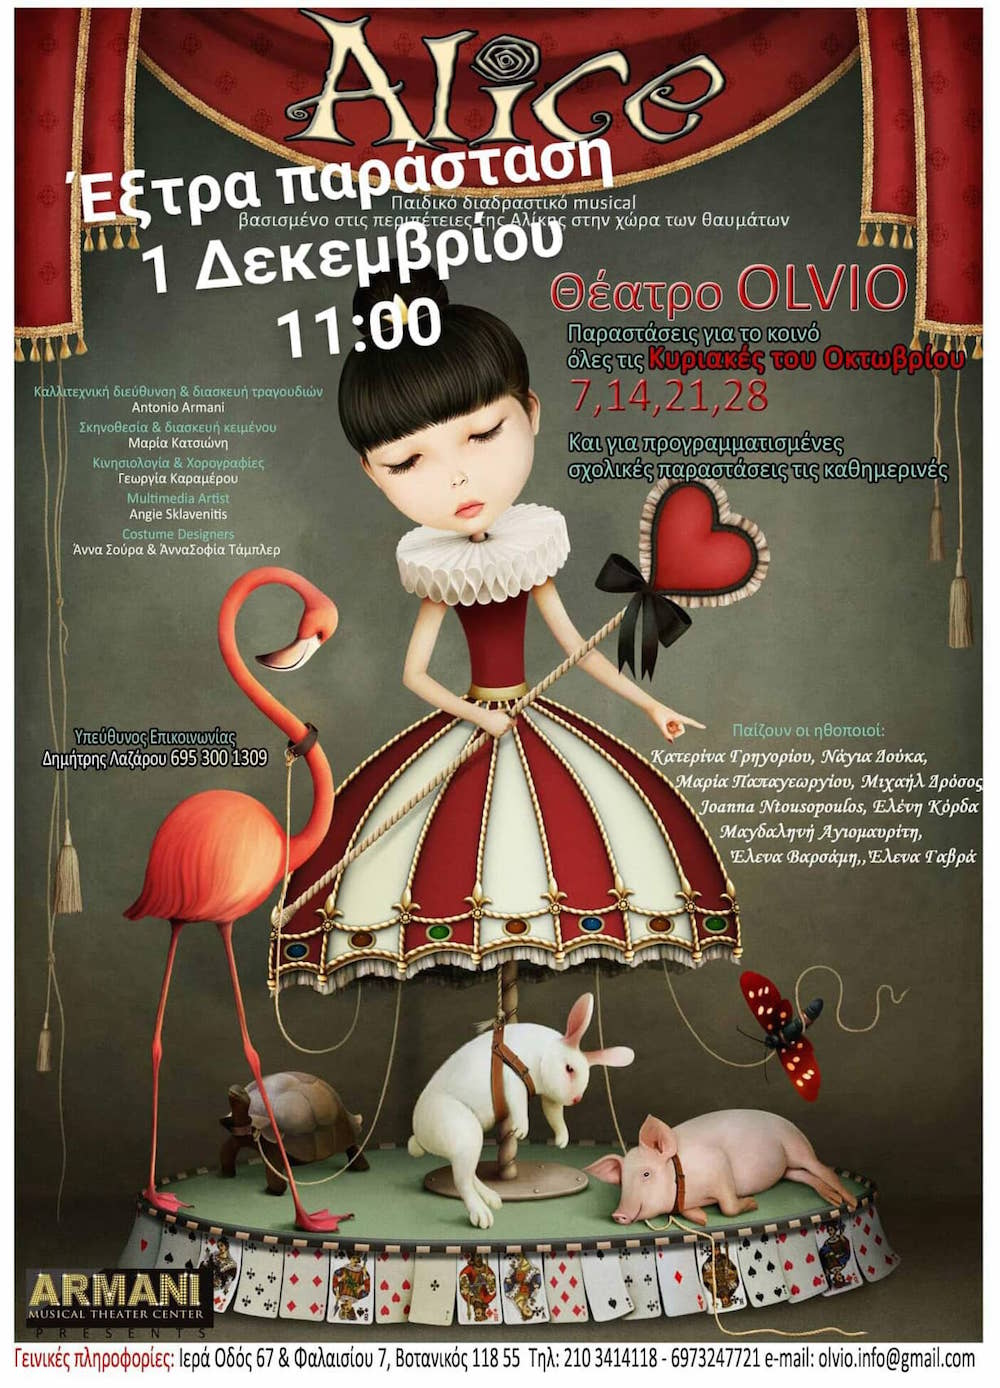 Armani Musical theater center, ALICE στο θέατρο OLVIO